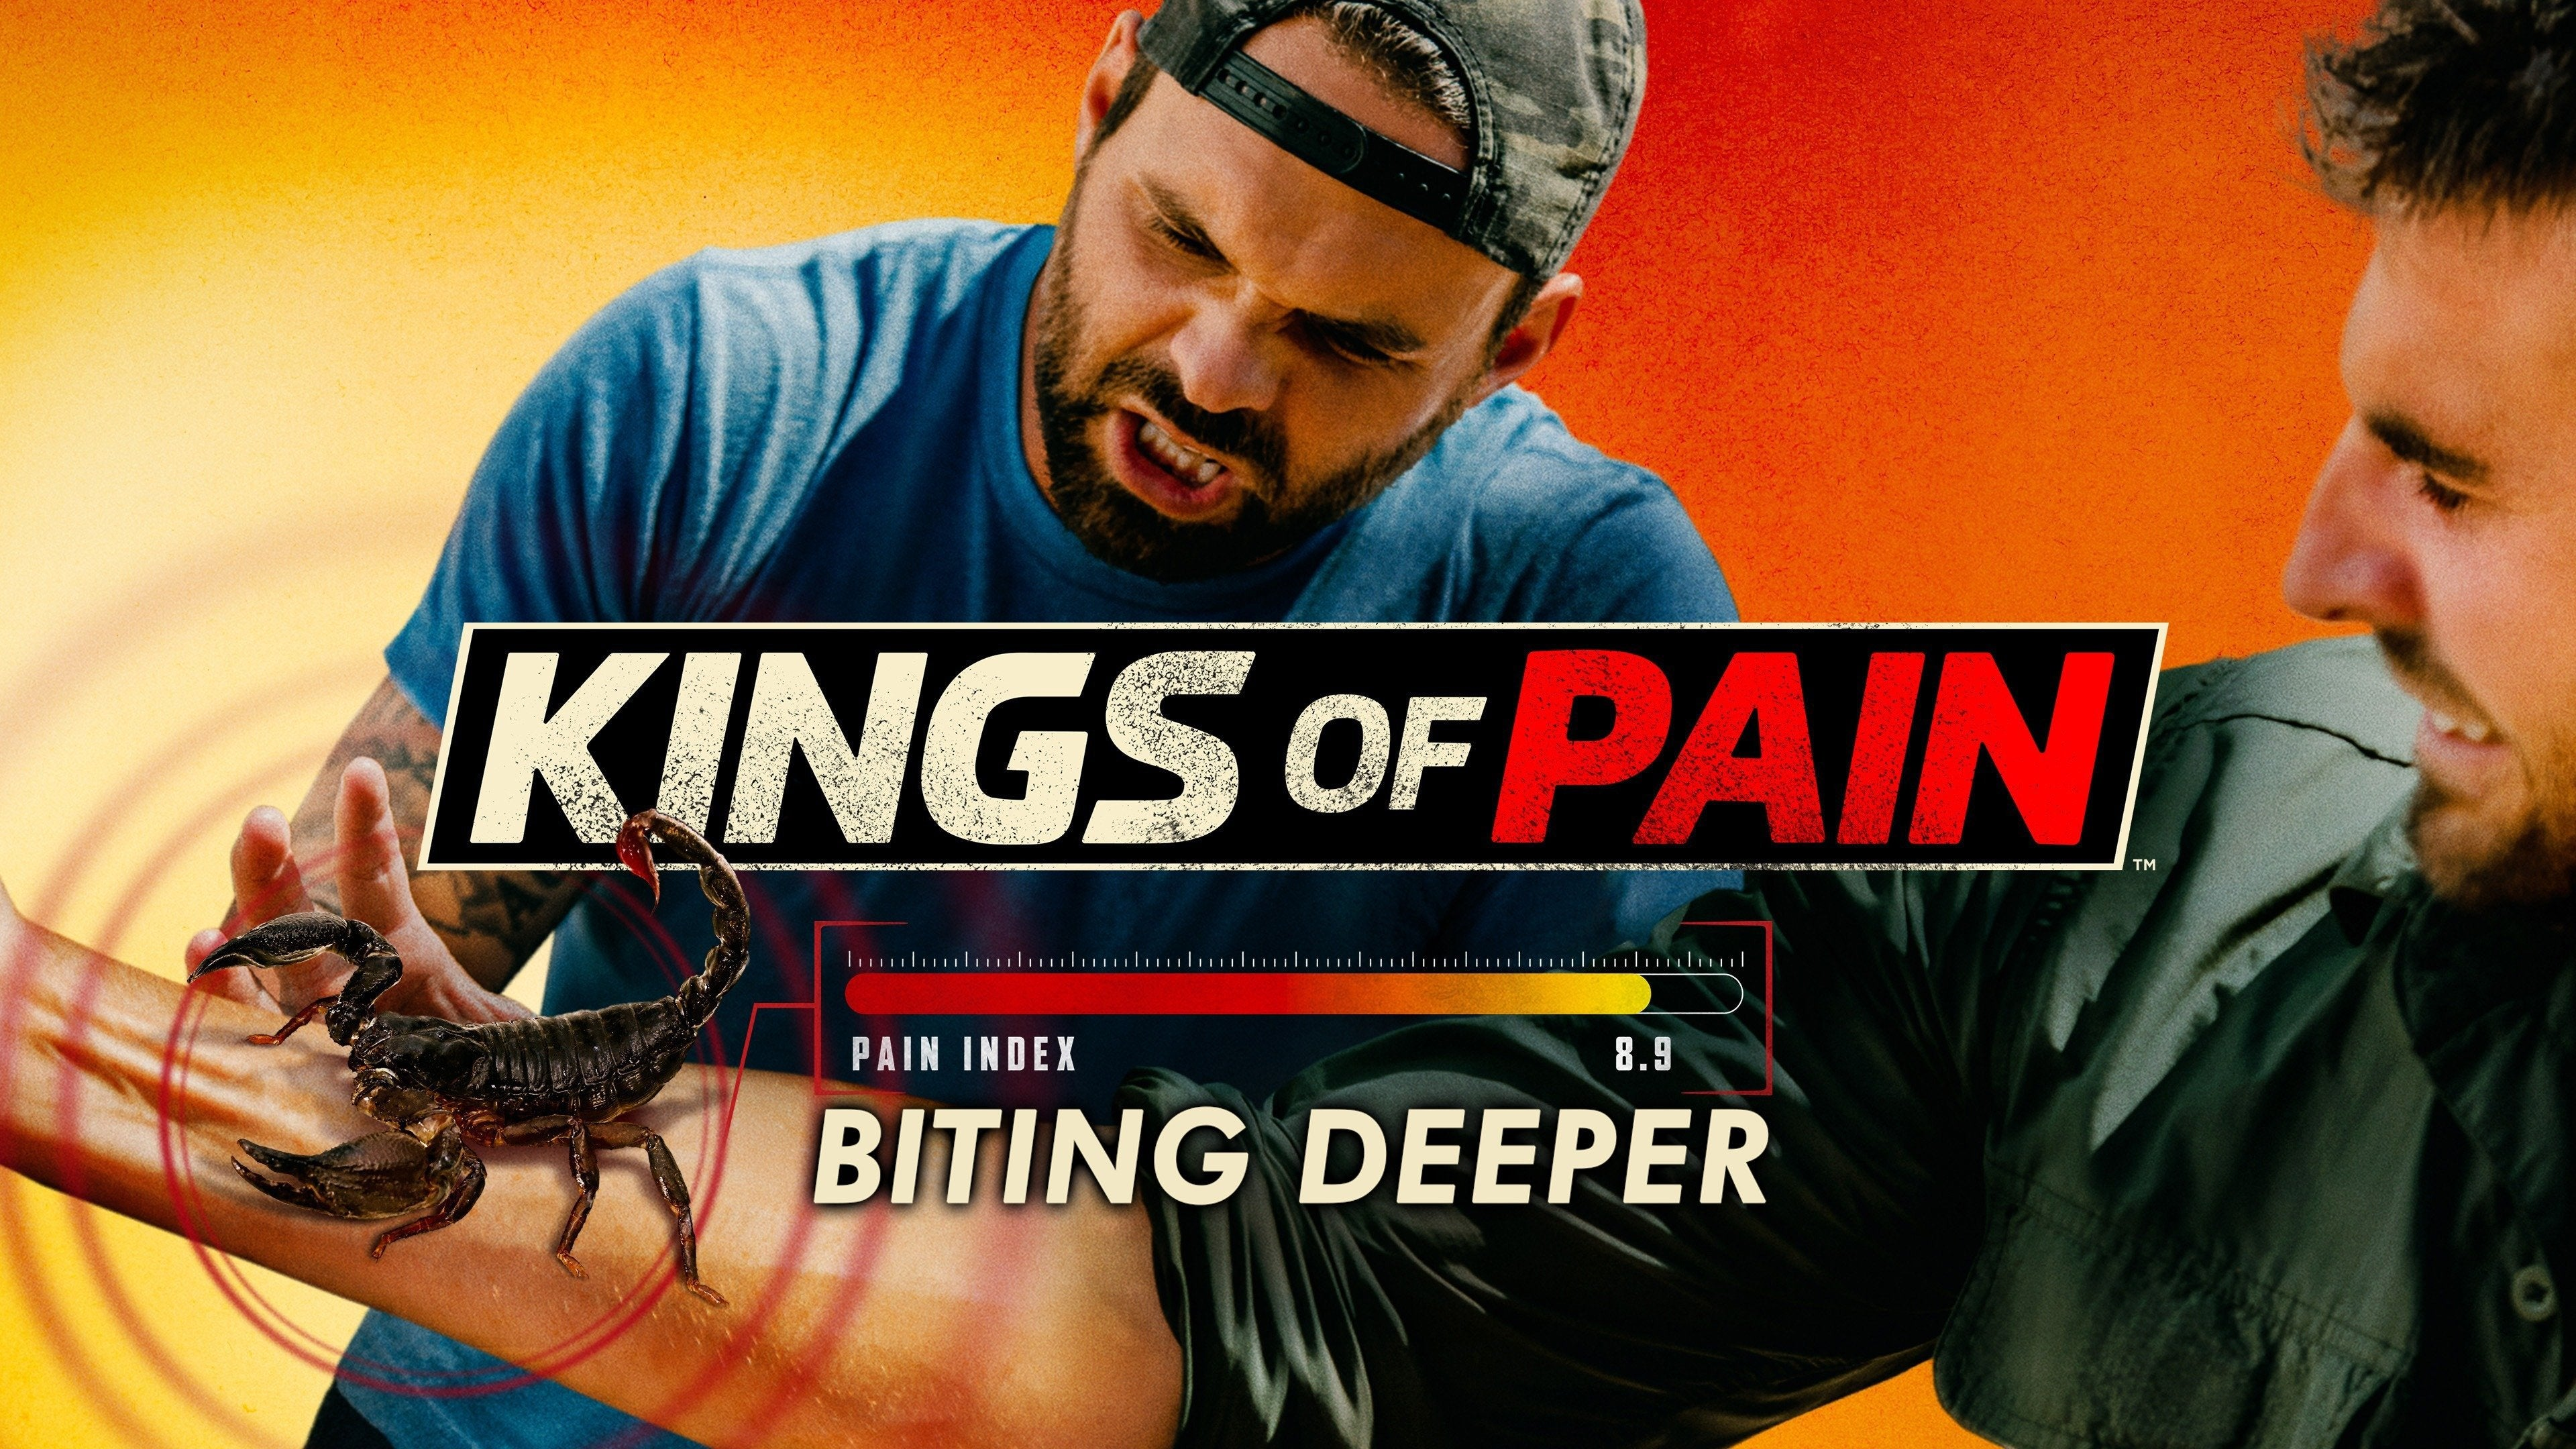 Kings of Pain: Biting Deeper